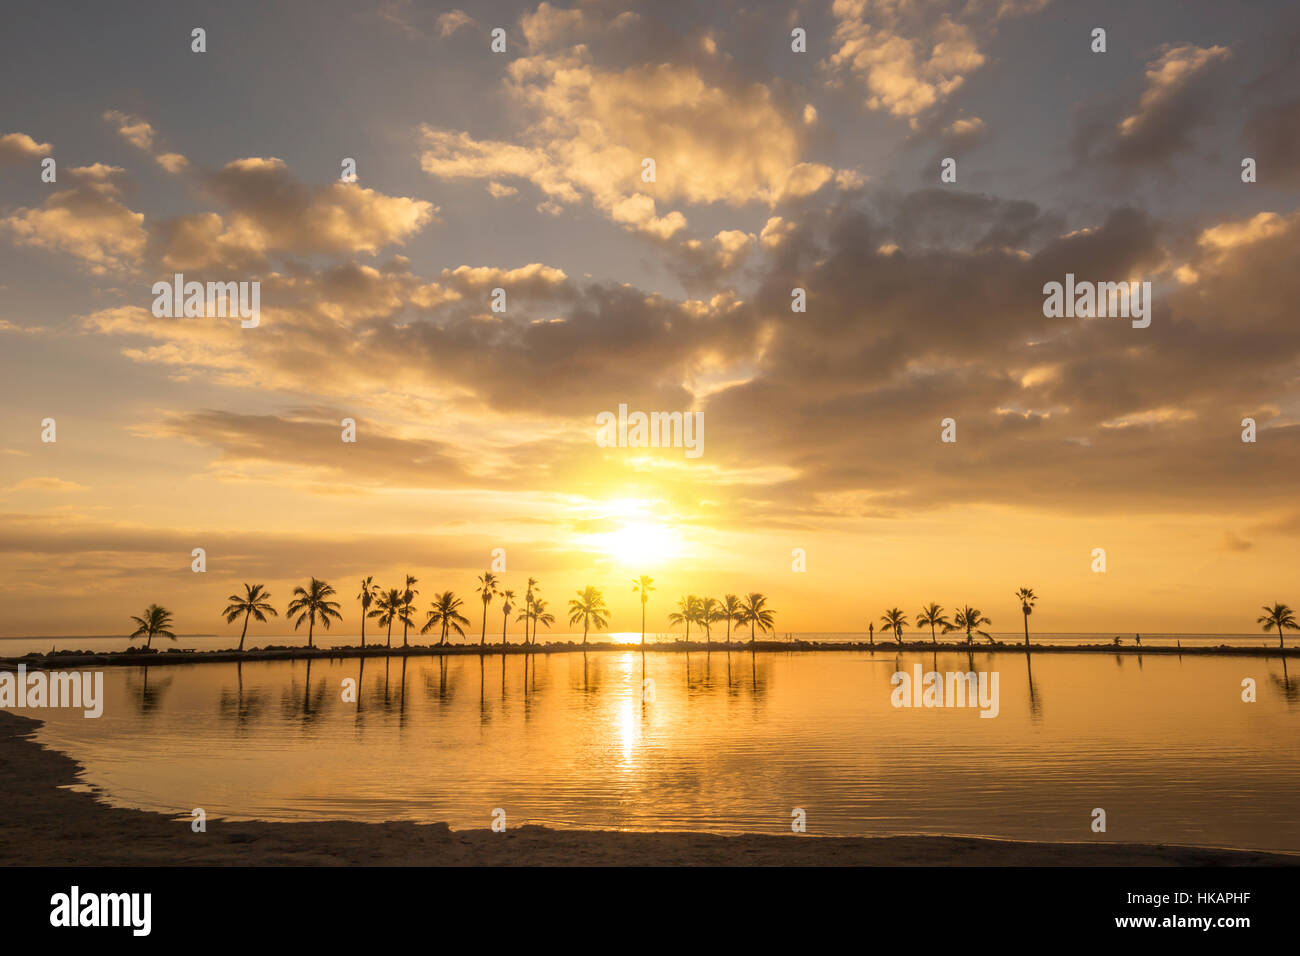 REFLECTING POOL ATOLL MATHESON HAMMOCK COUNTY PARK MIAMI FLORIDA USA - Stock Image